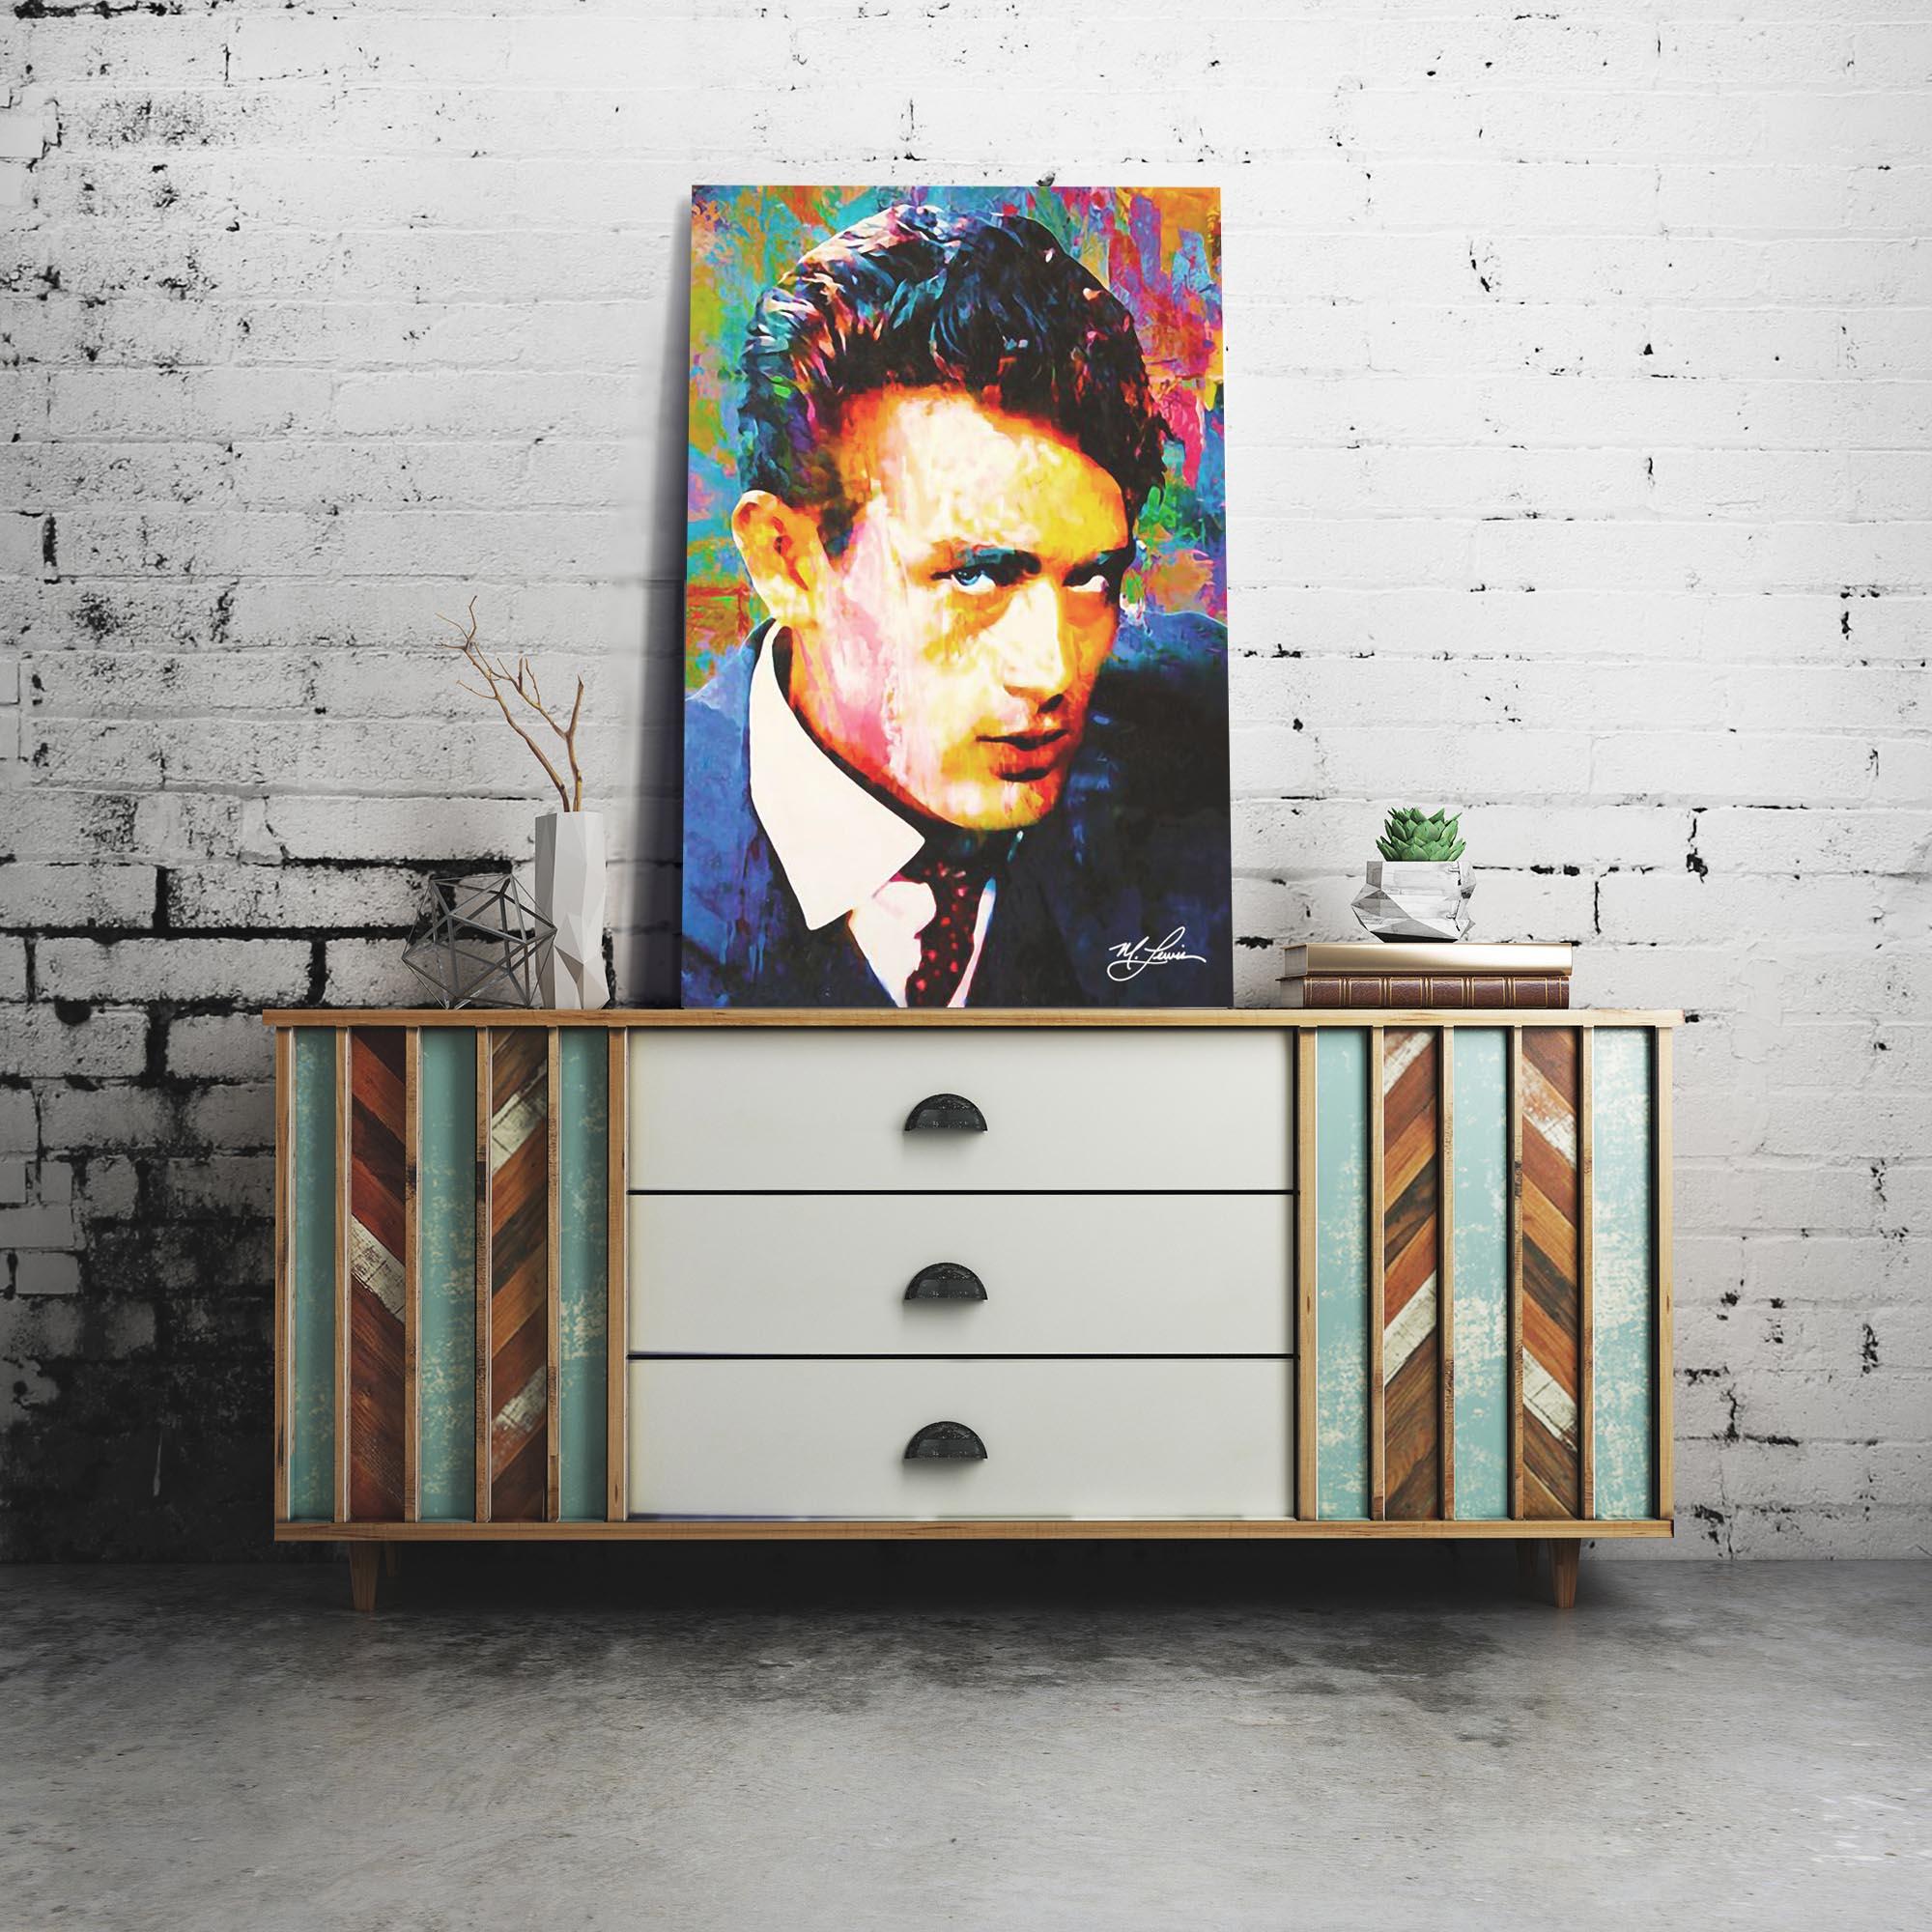 James Dean Lifes Significance by Mark Lewis - Celebrity Pop Art on Metal or Plexiglass - ML0039